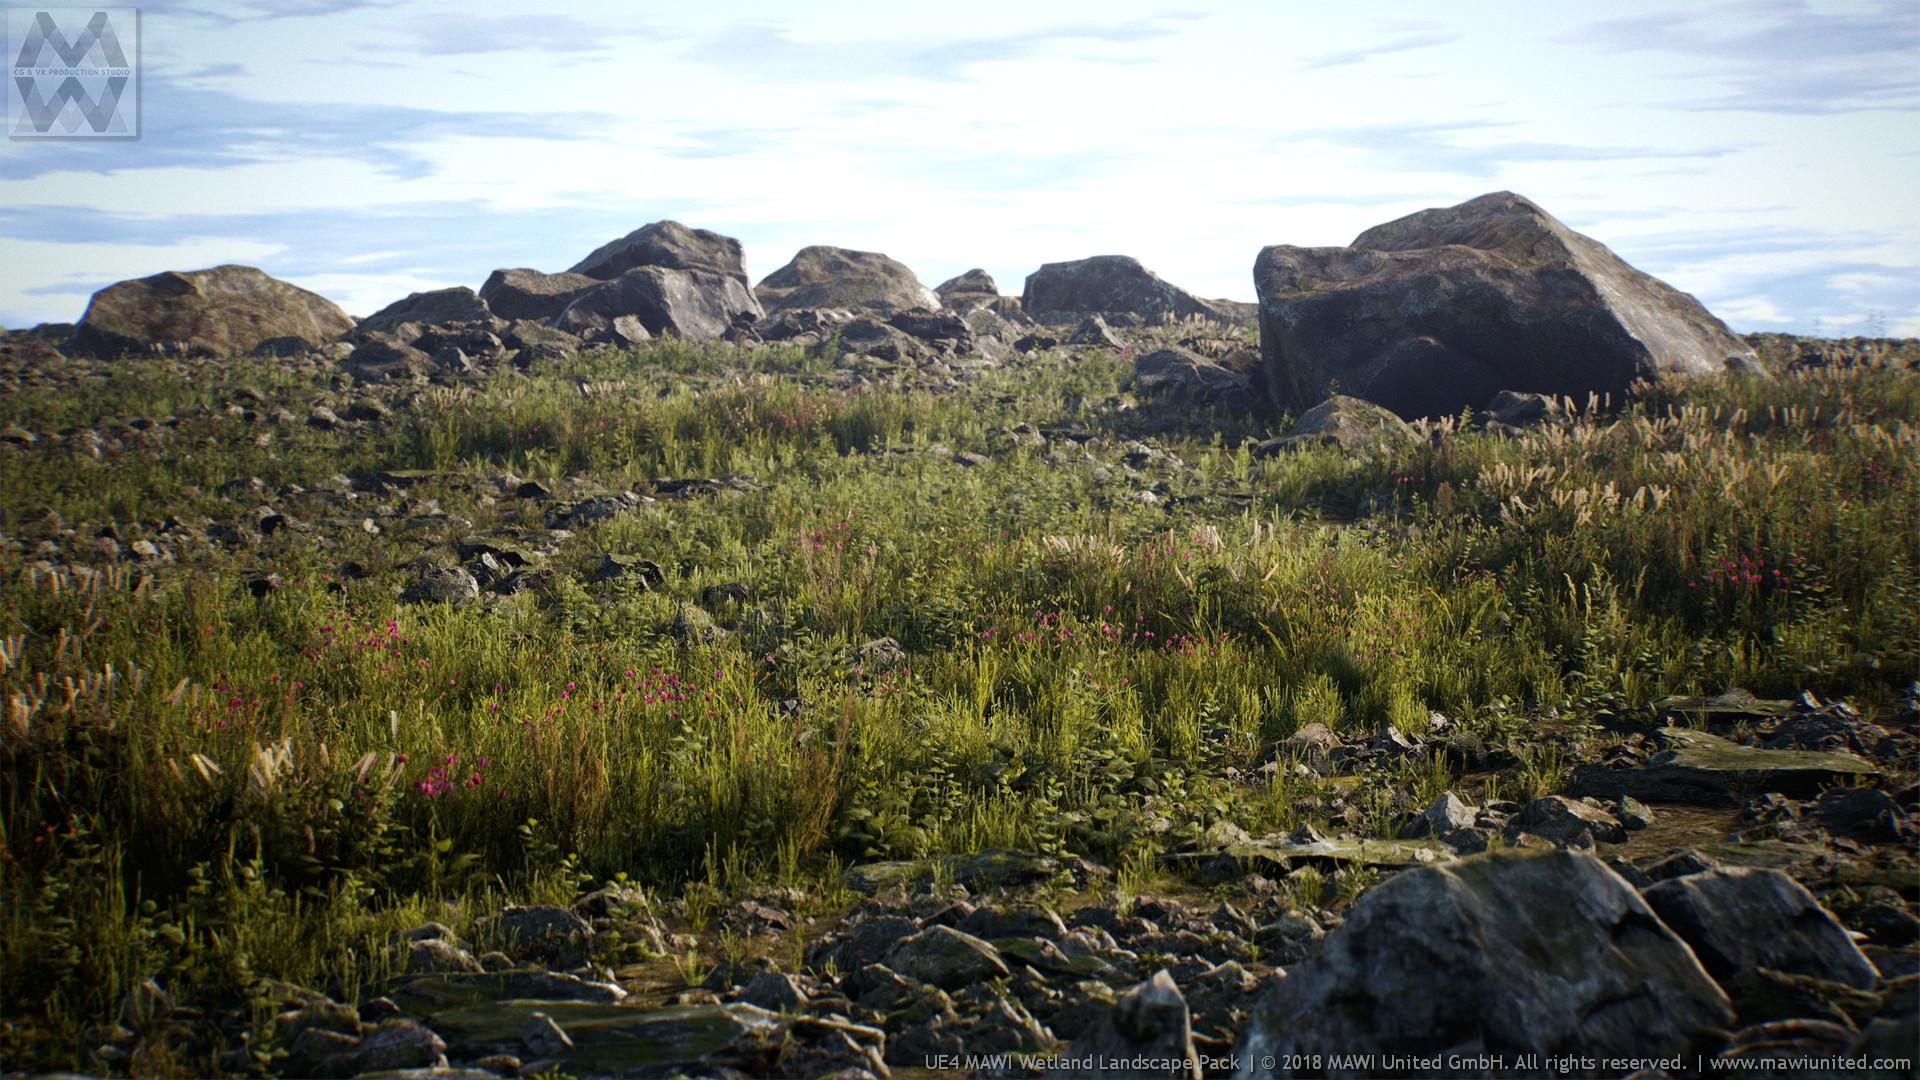 ArtStation - UE4 Wetland Landscape, Willi Hammes